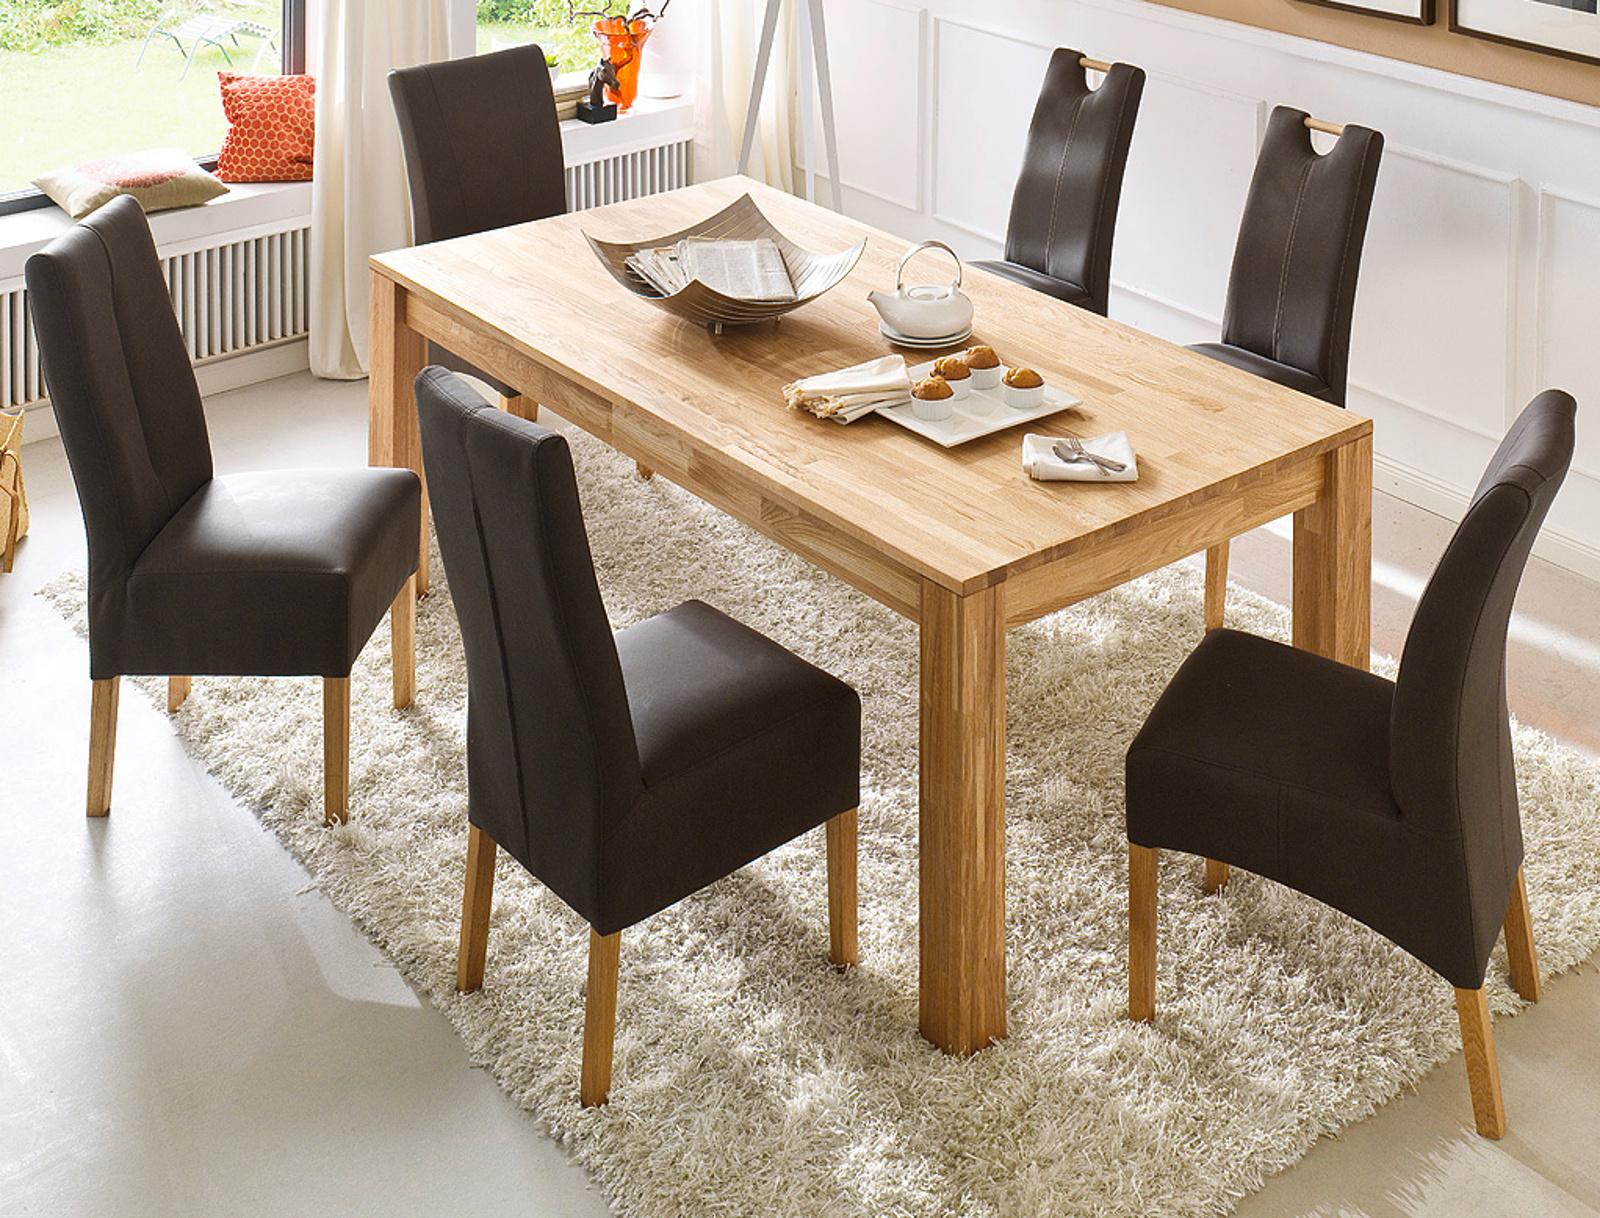 Moderne Büromöbel in Buche - Designermöbel - moderne Möbel | owl ...